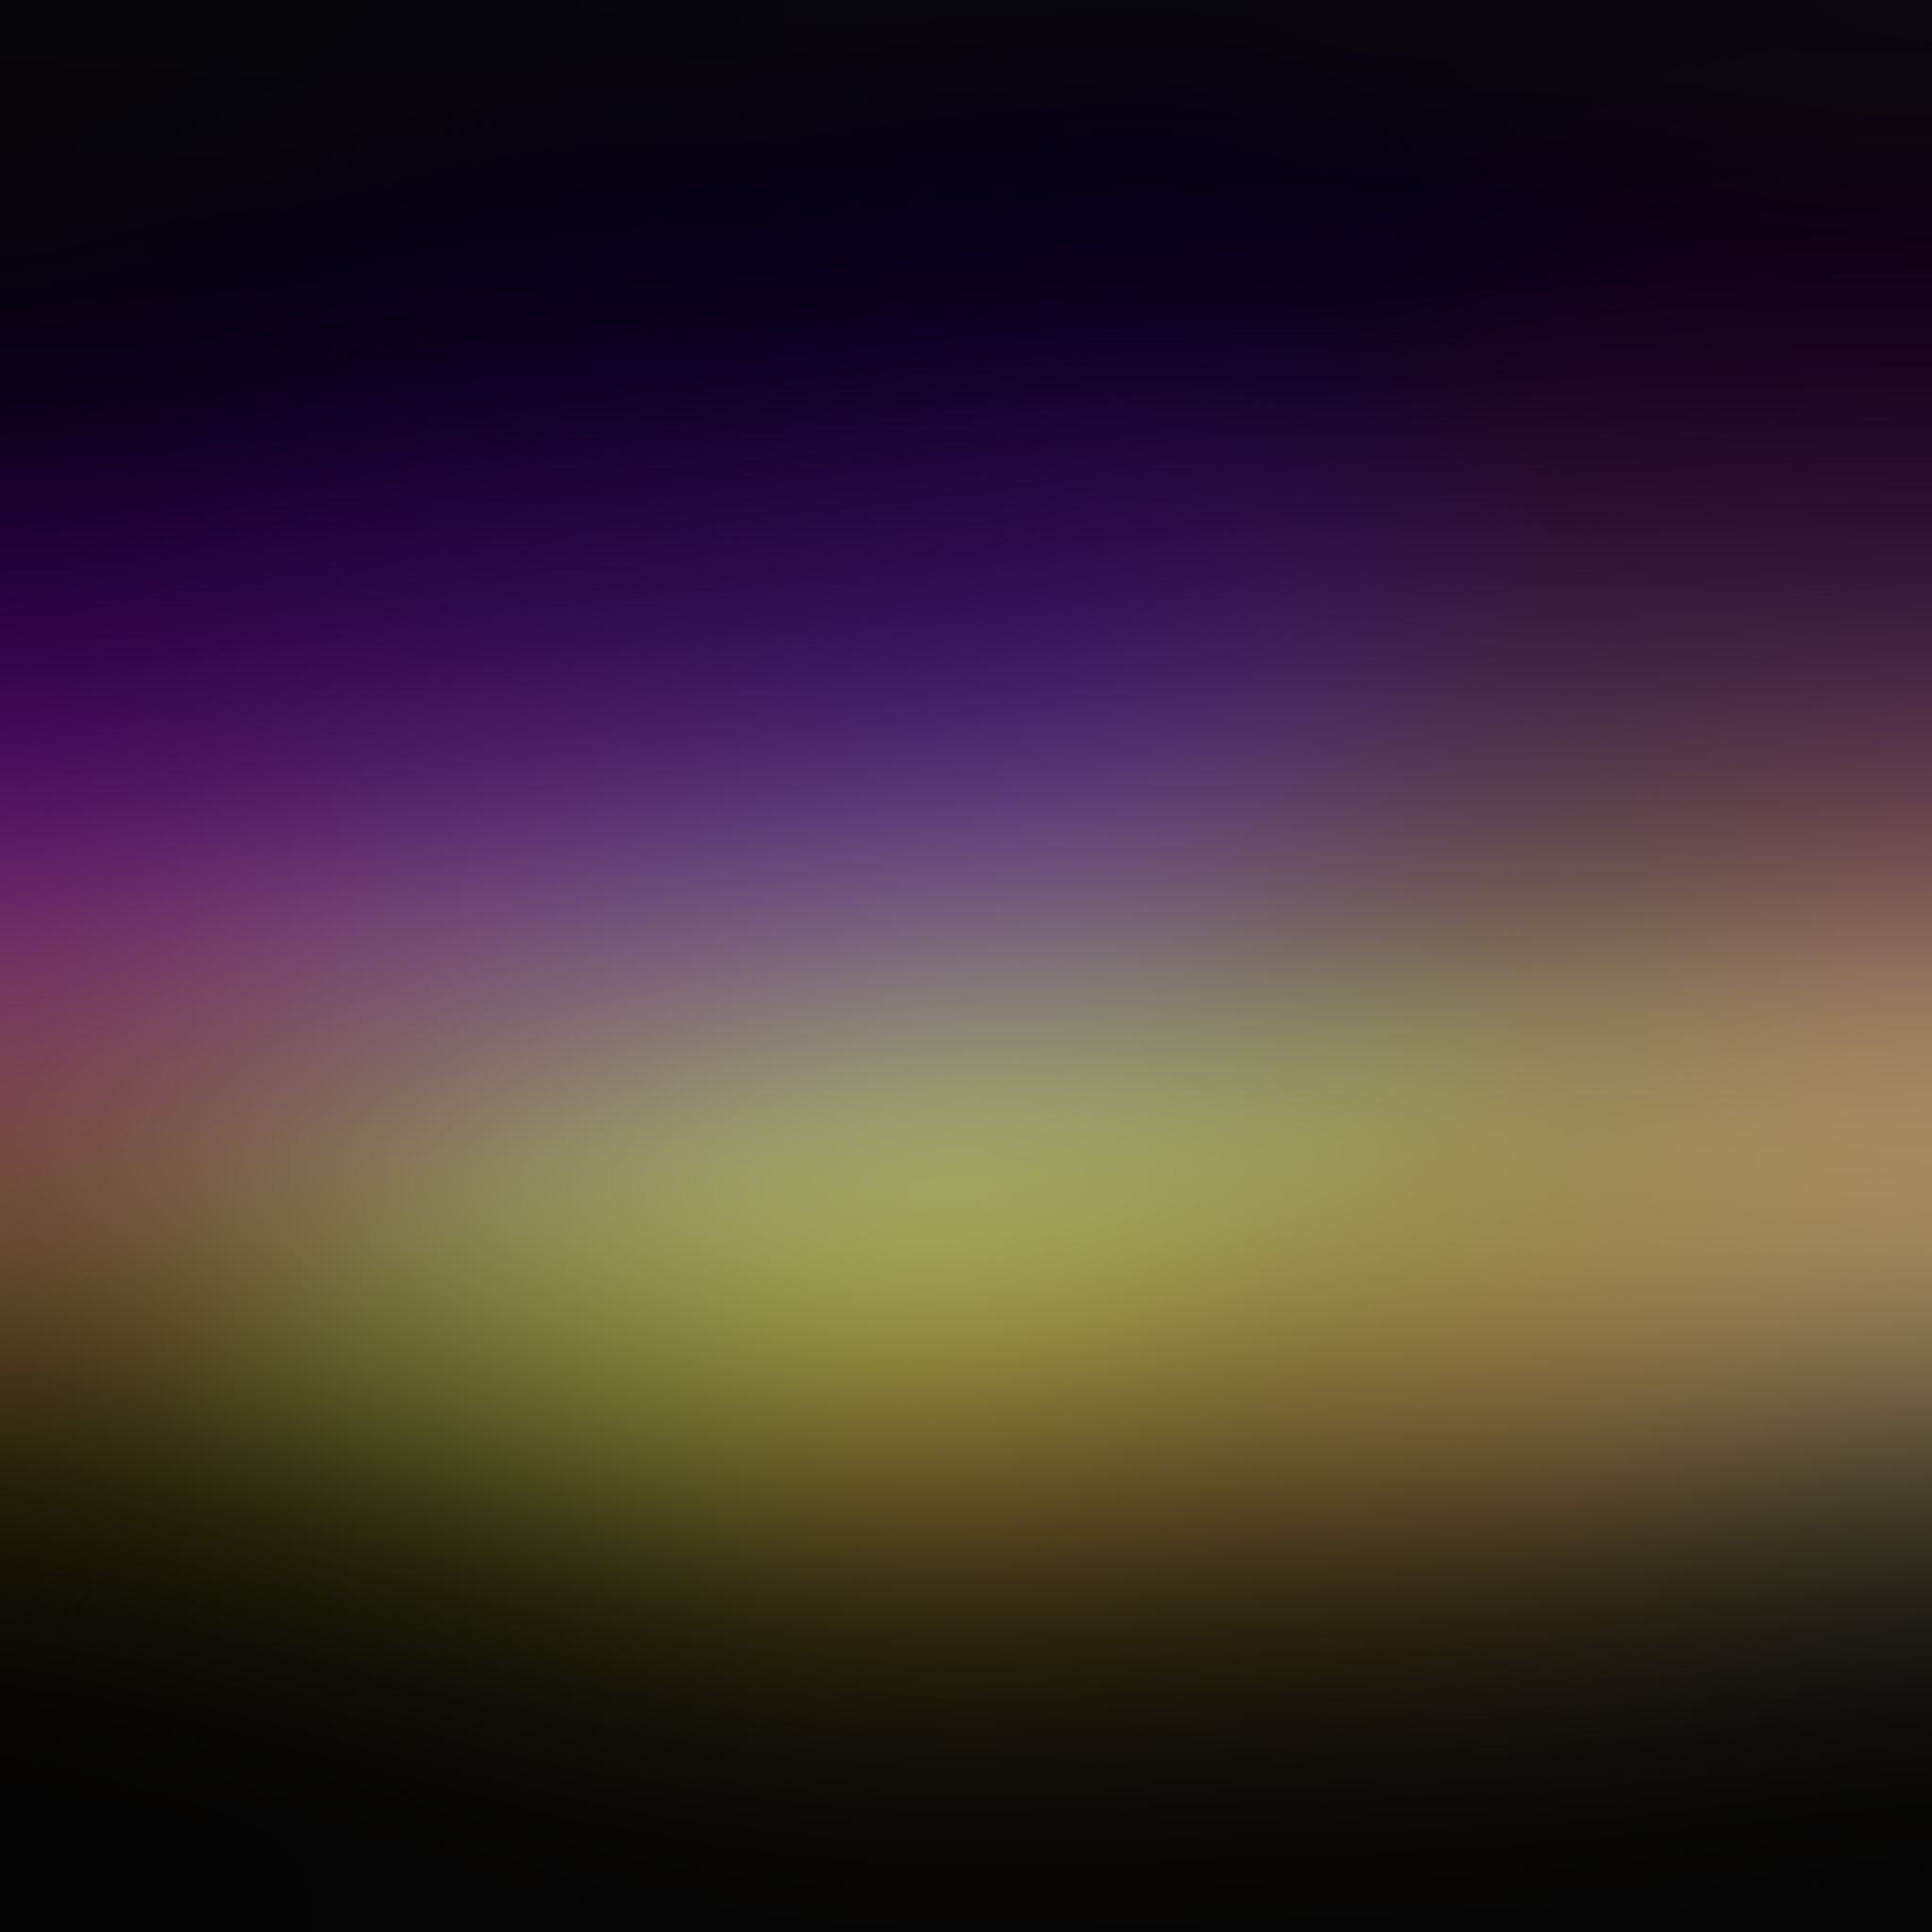 Sunset Aurora Night Purple Gradation Blur Ipad Air Wallpapers Free Download